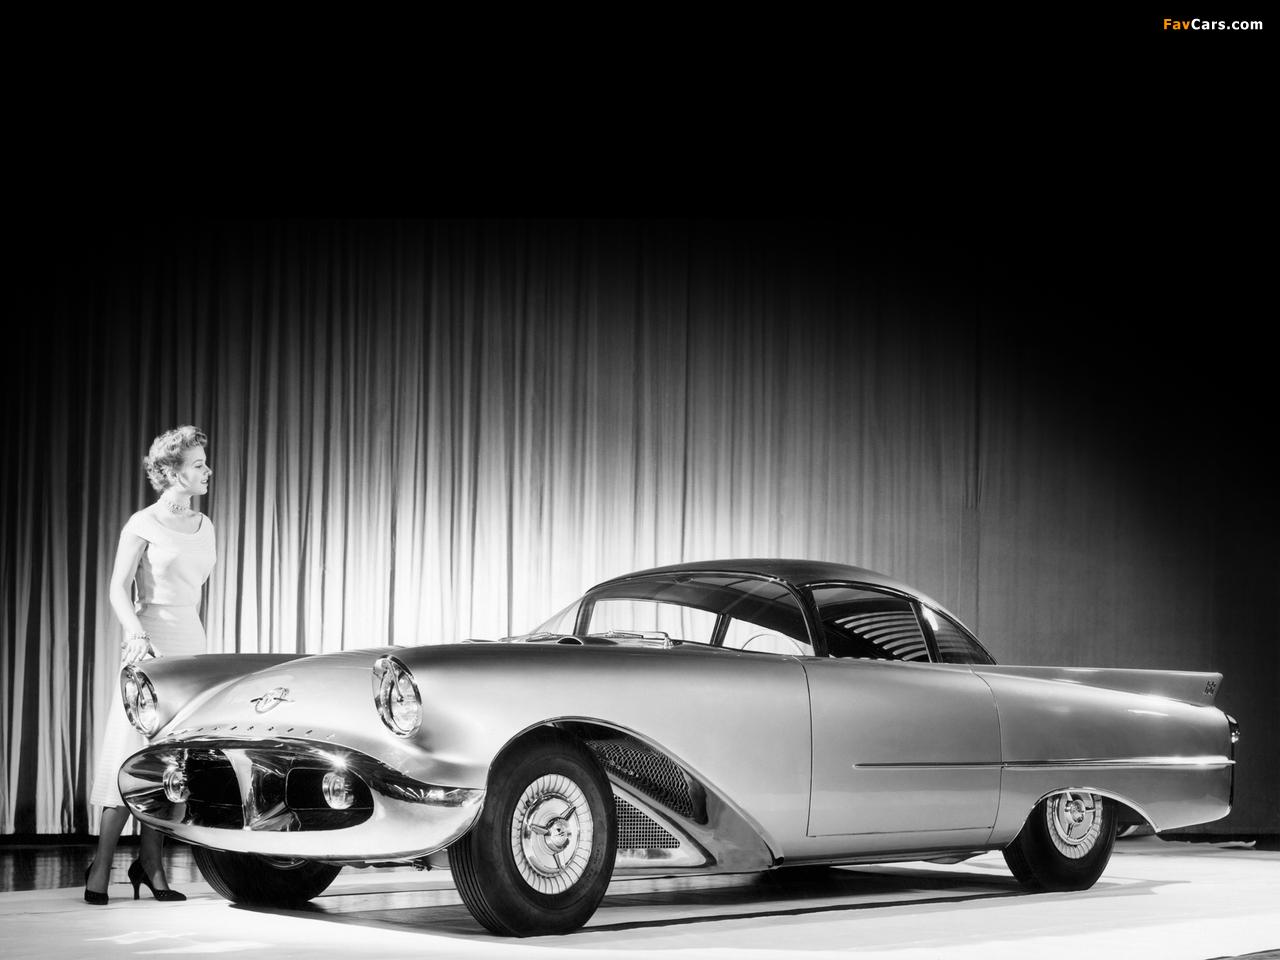 Oldsmobile Cutlass Concept Car 1954 wallpapers (1280 x 960)